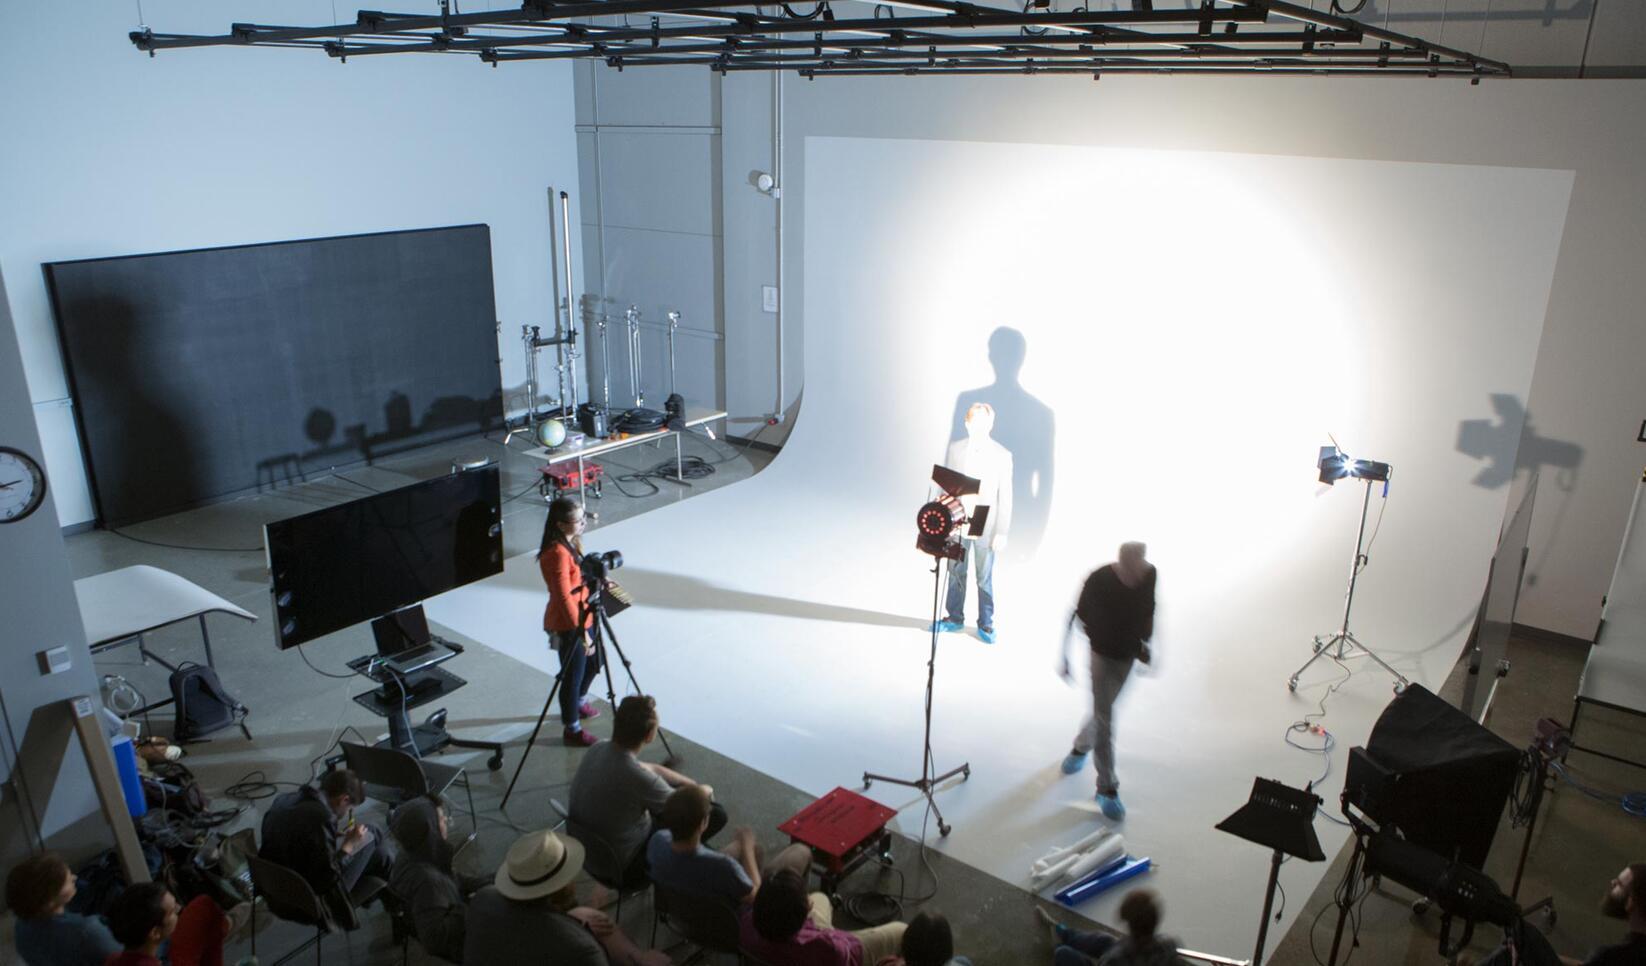 Overhead shot of the gray studio